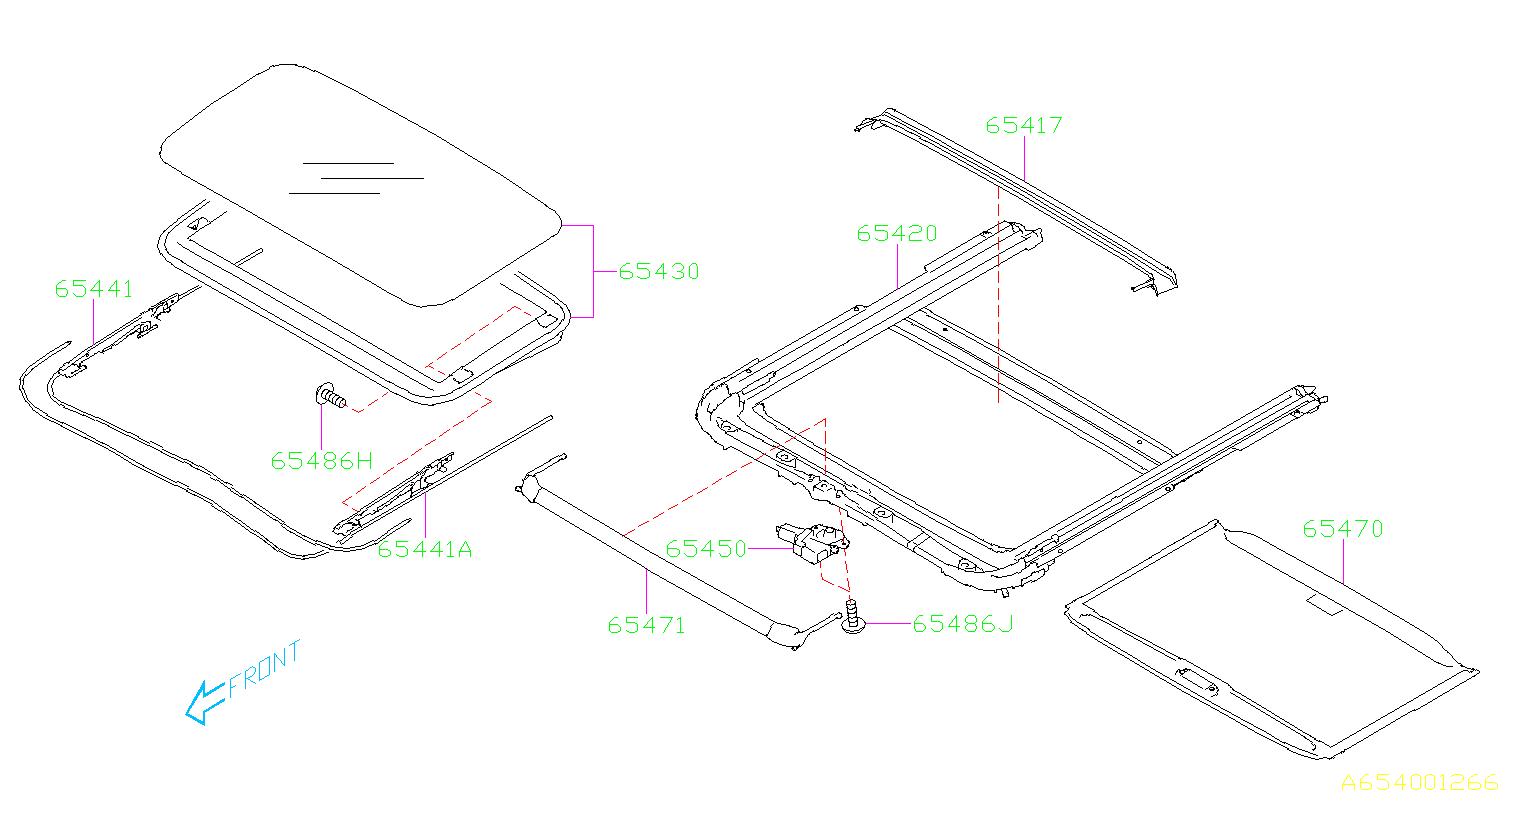 Subaru Outback Sun Shade Assembly Sunroof Roof Interior Body